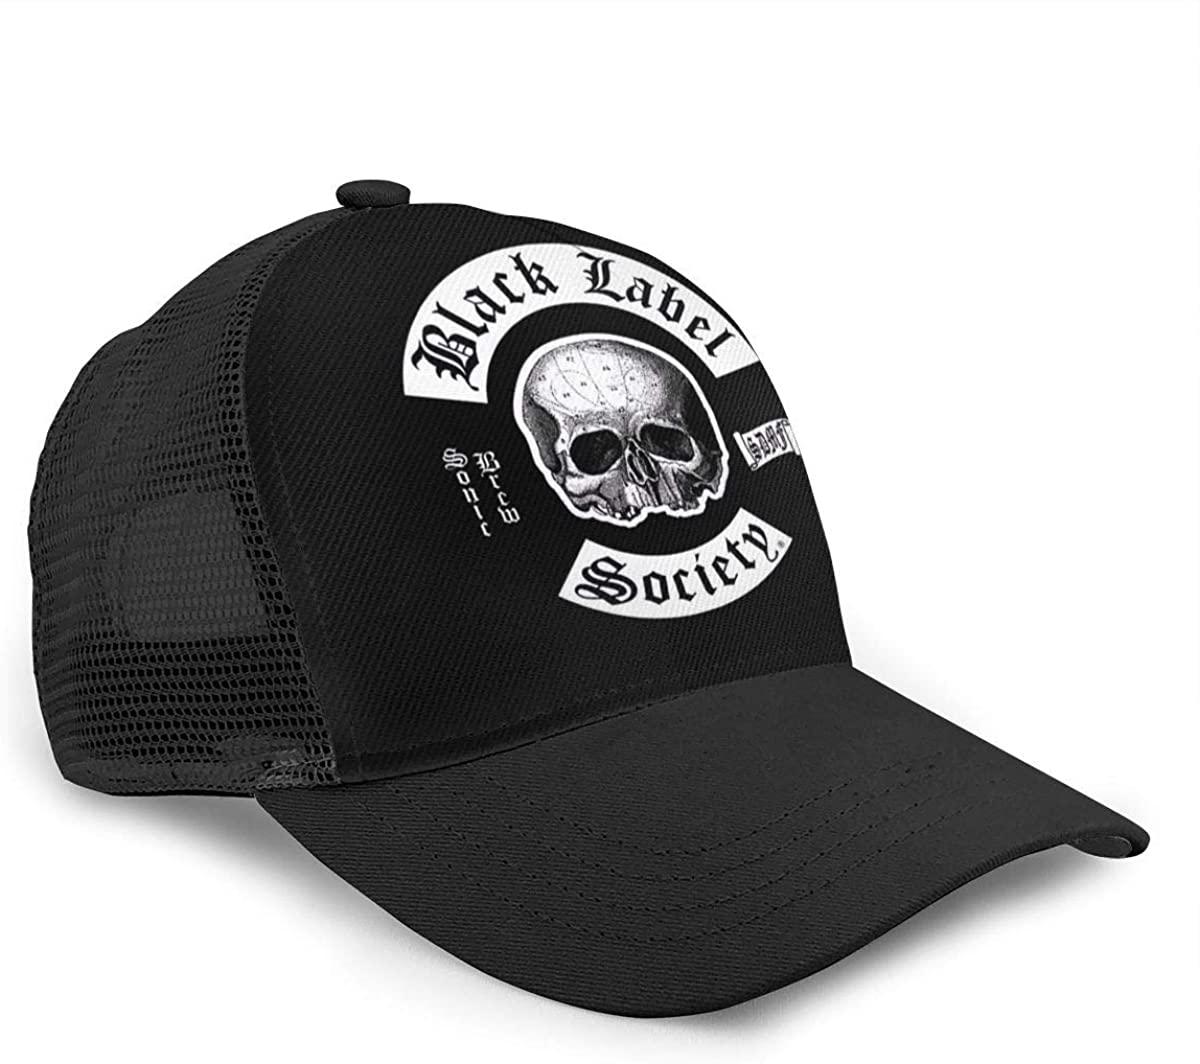 Vicnen Black Label Society Unisex Baseball Cap for All Seasons Adjustable Grid Sports Hat Black